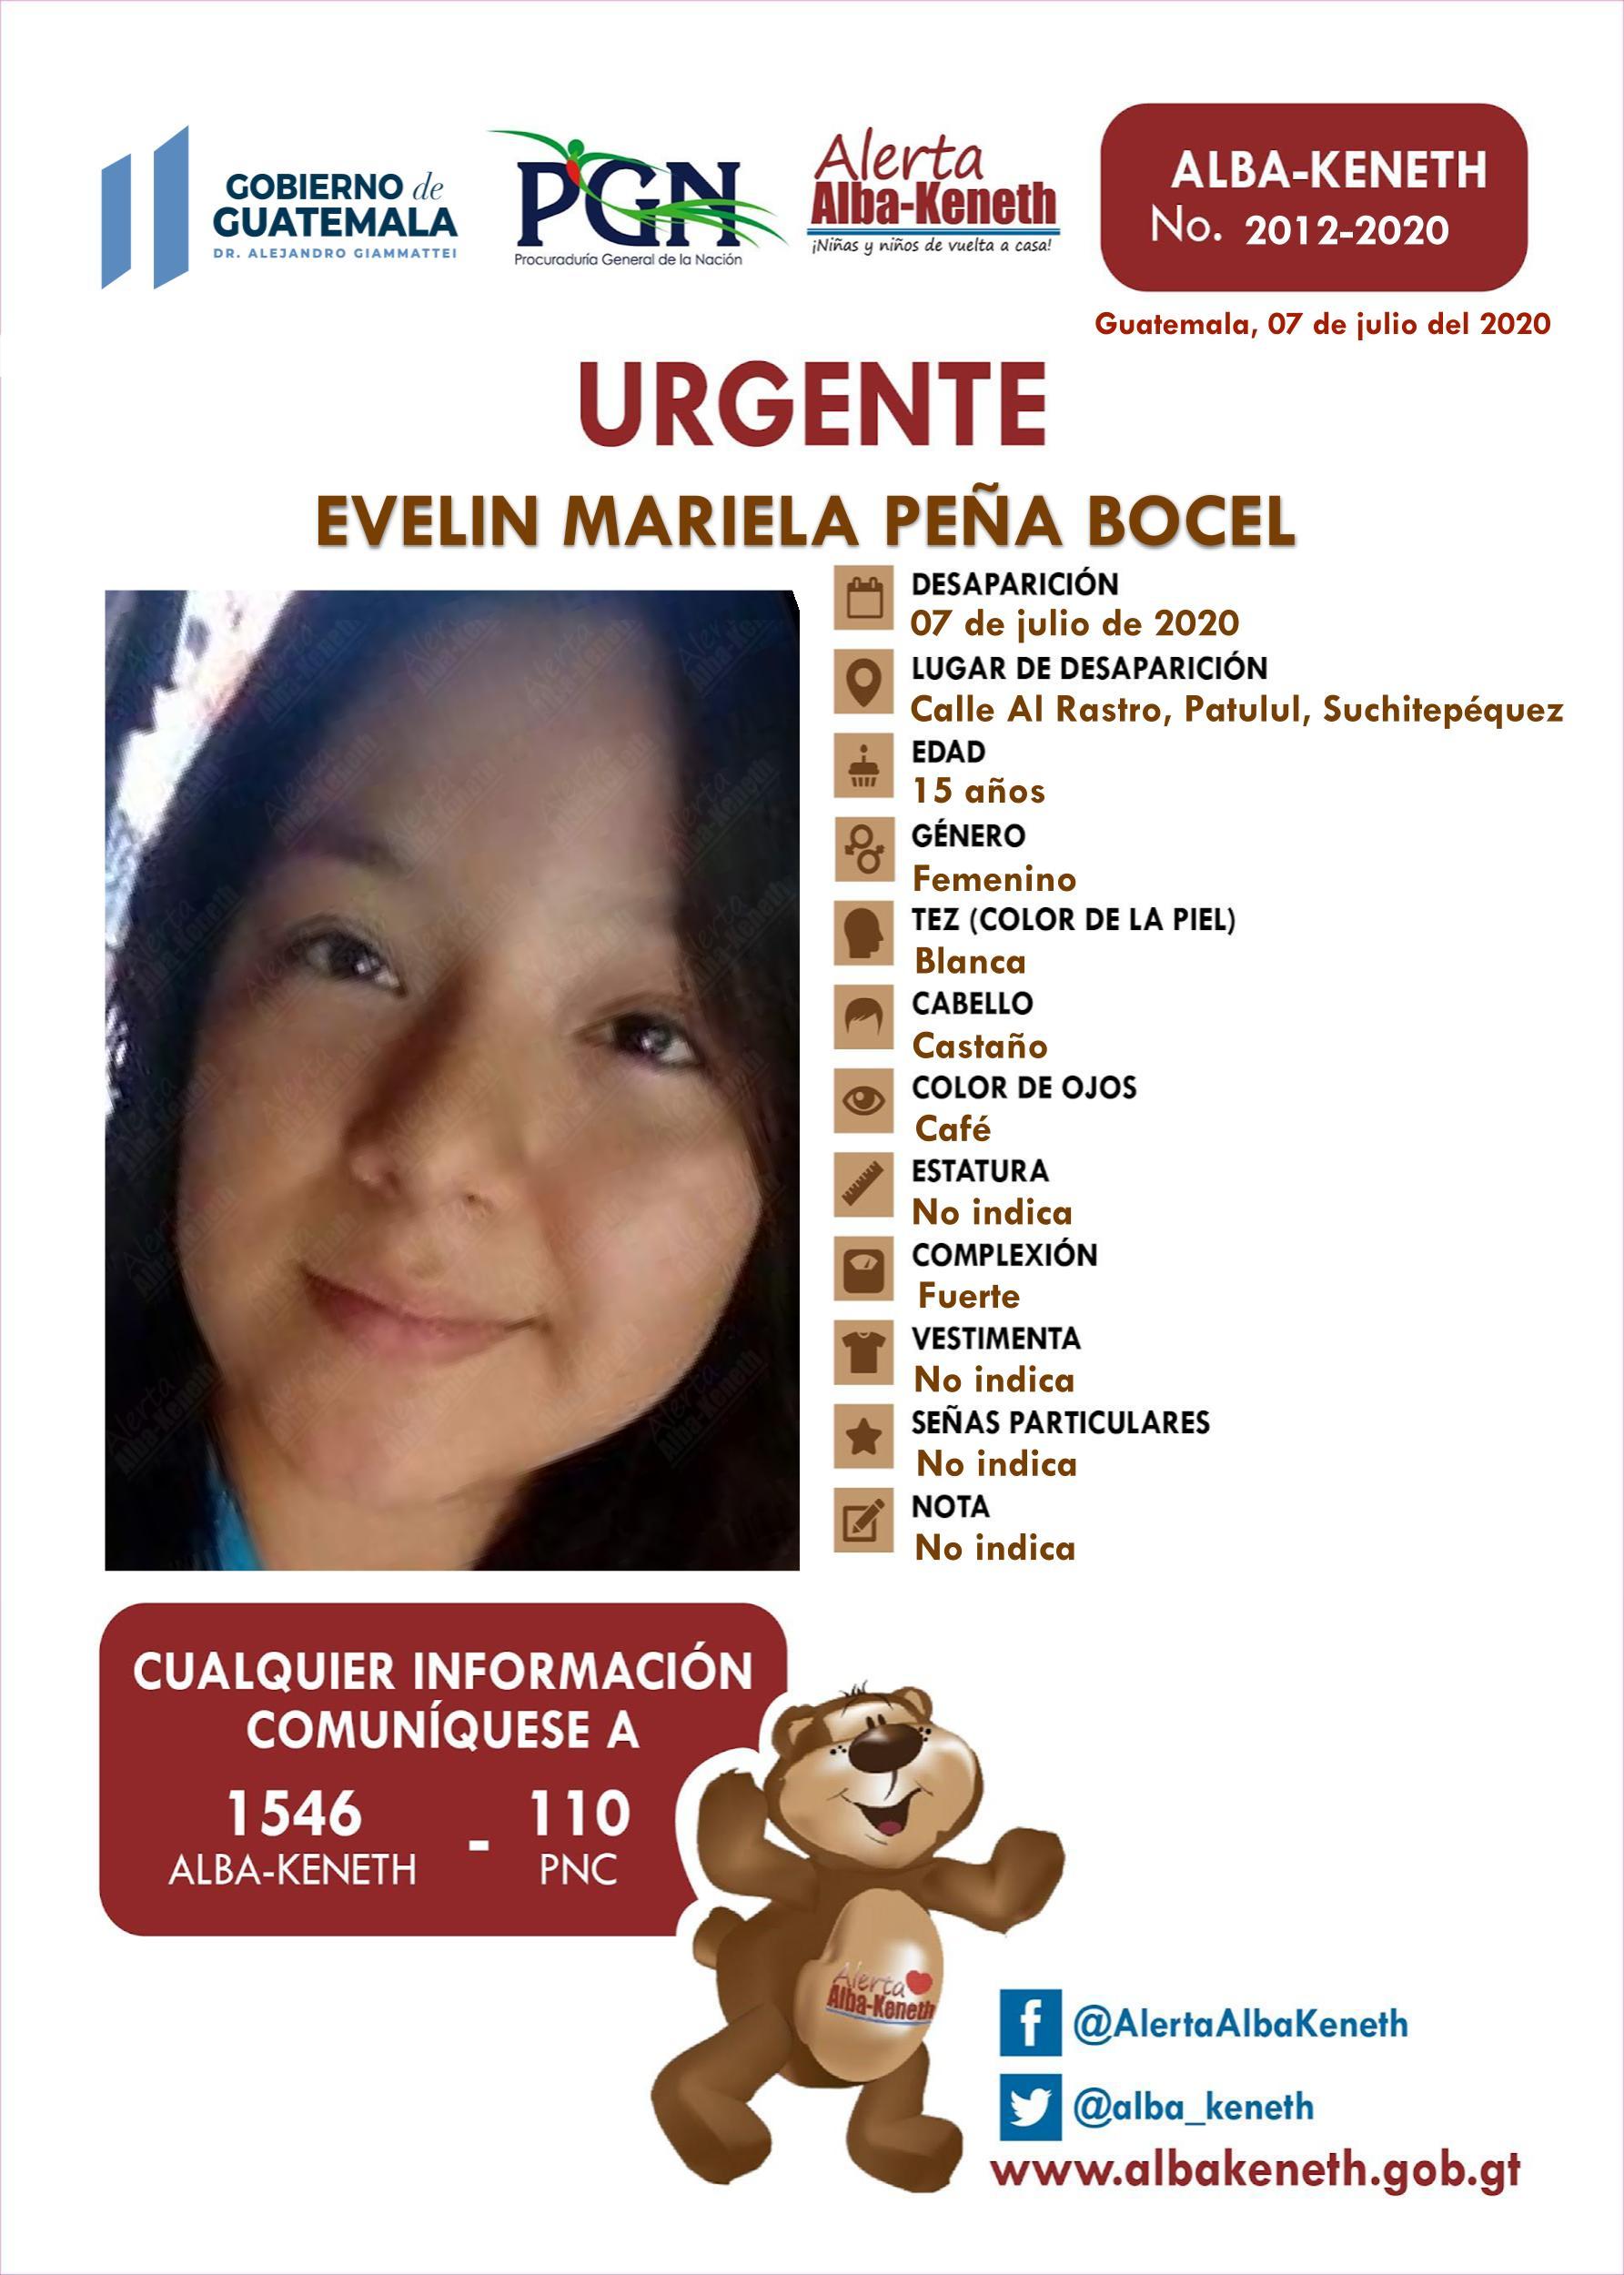 Evelyn Mariela Peña Bocel